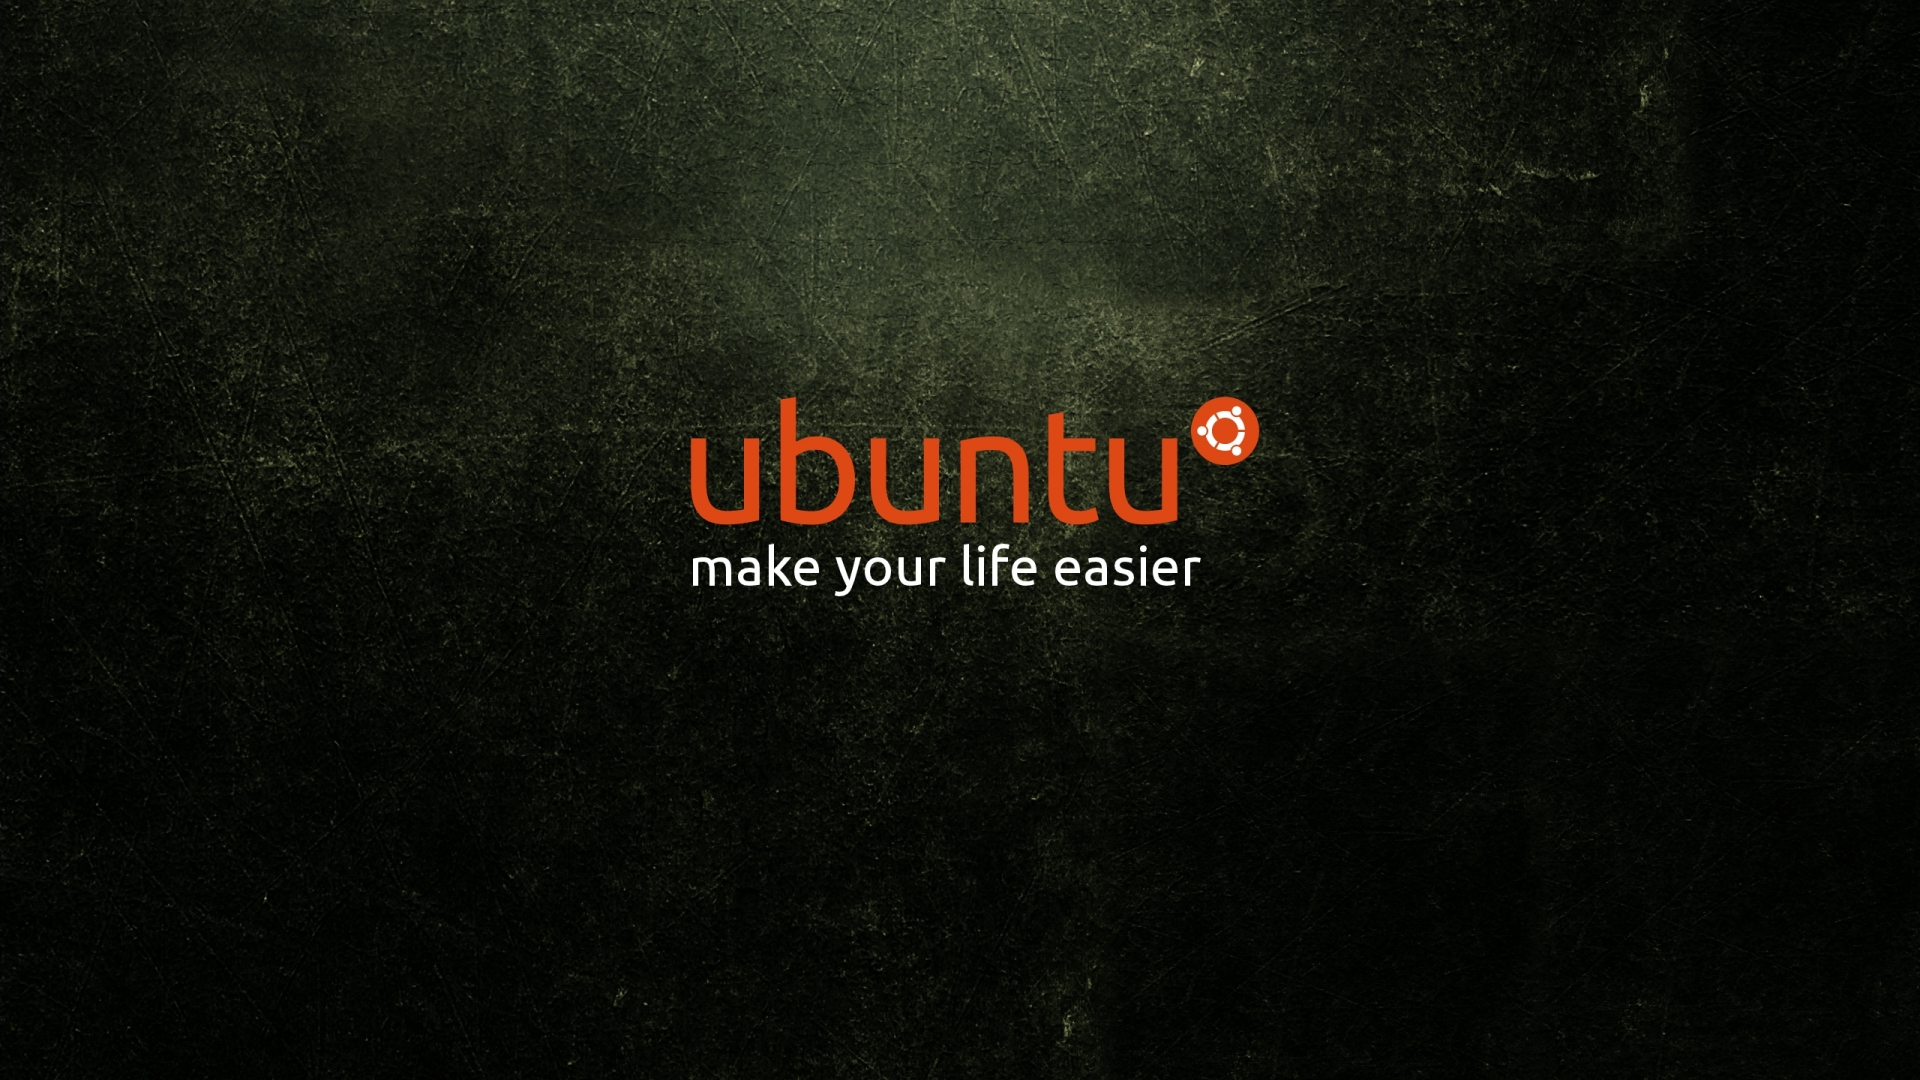 wallpaper ubuntu wallpapers resoluciones 1920x1080